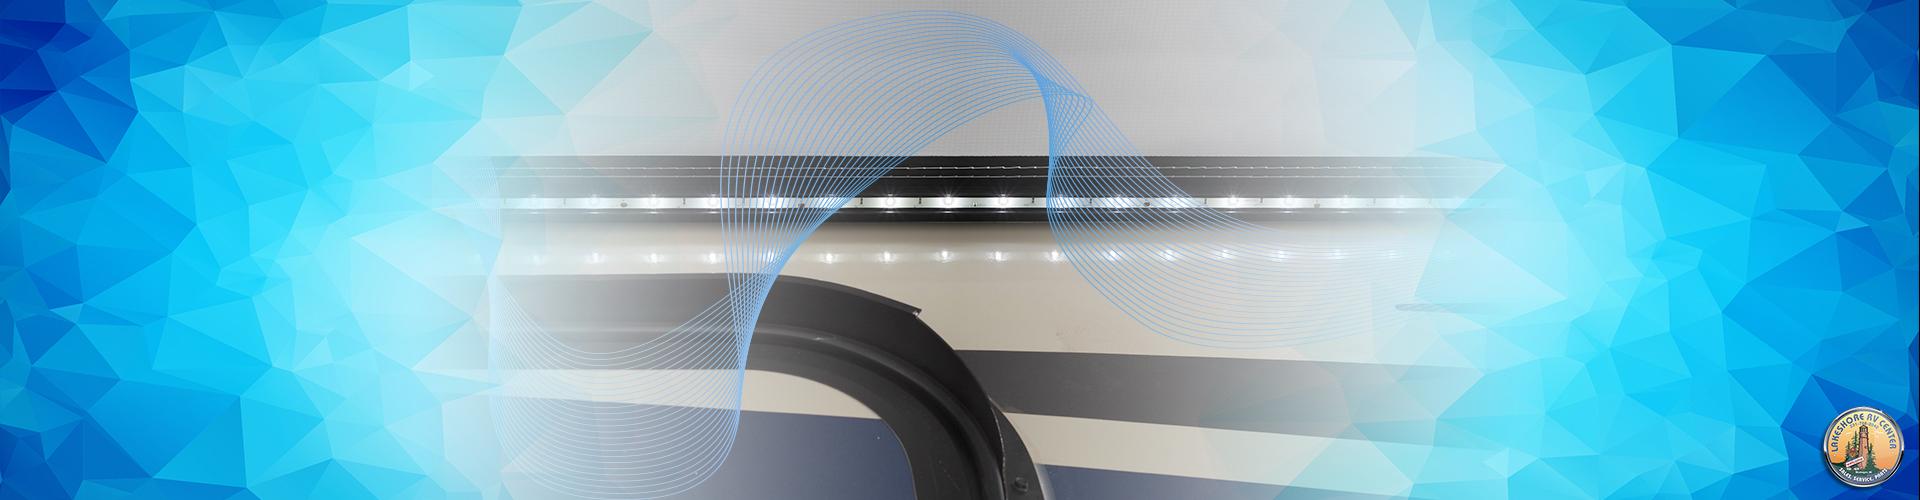 RV Awning LED lights